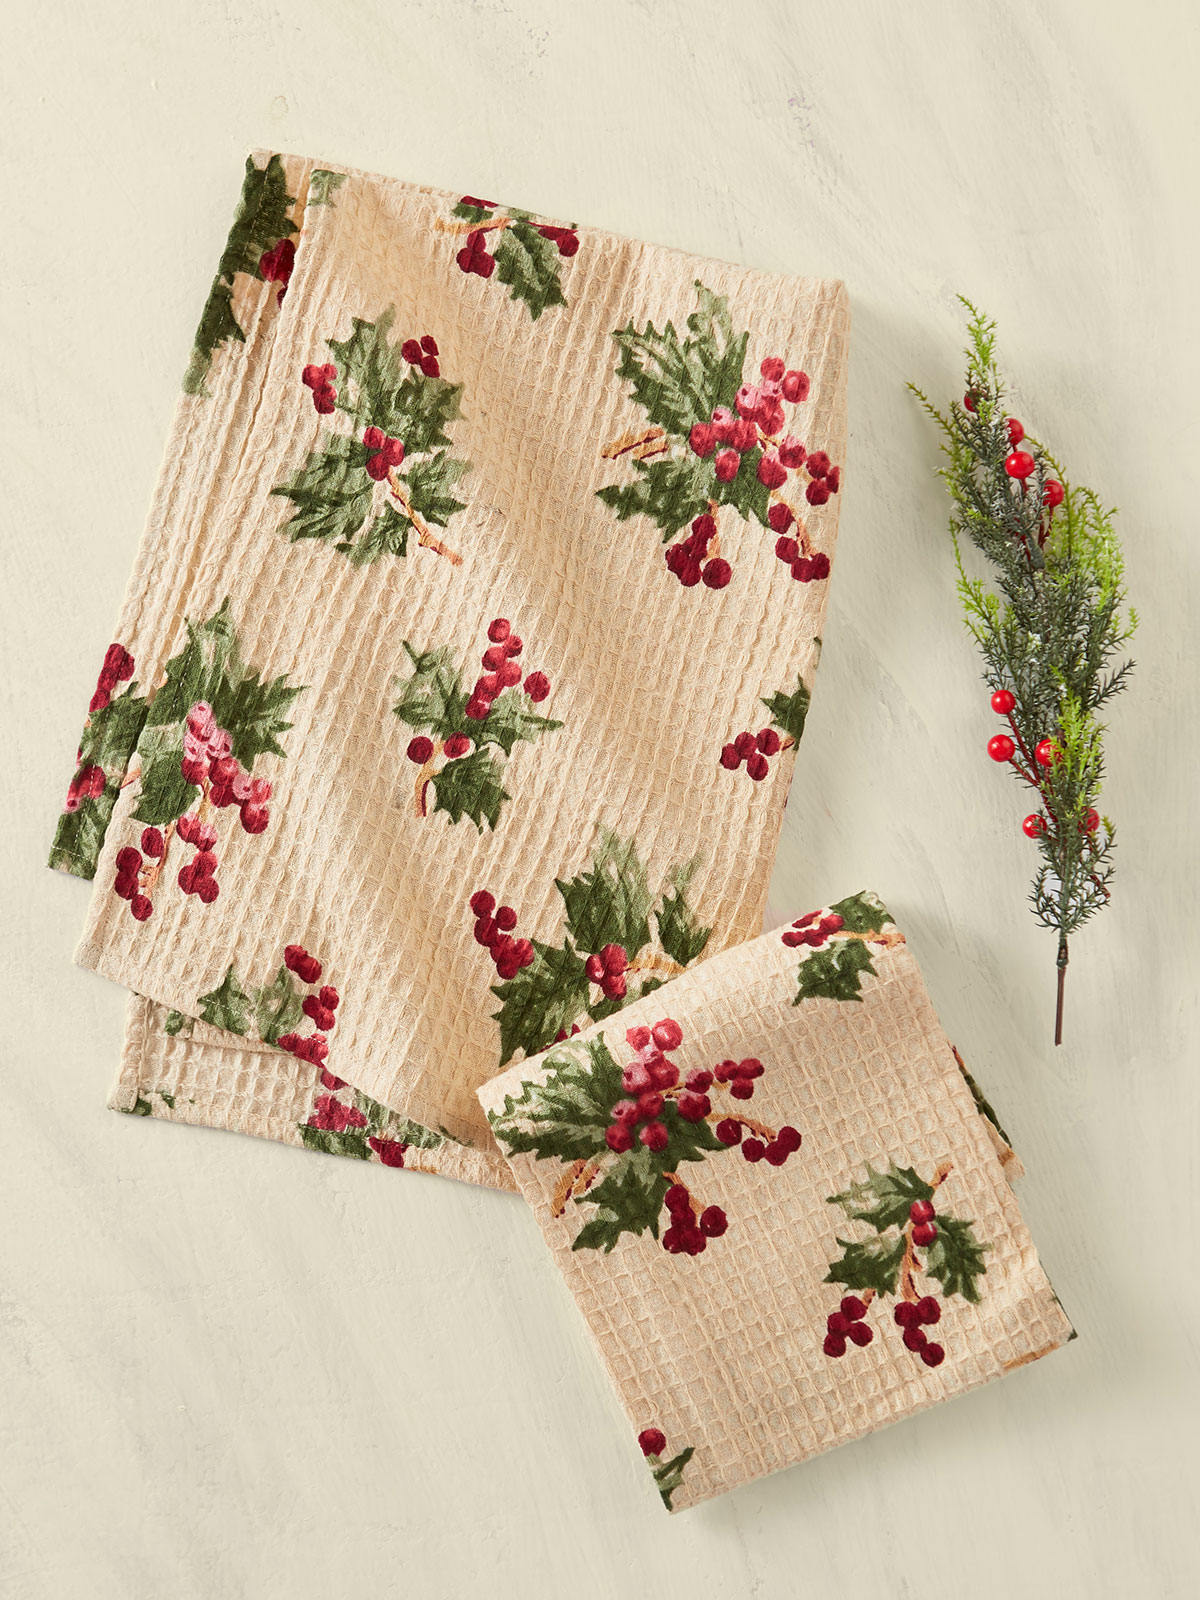 Holly Berry Tea Towel Set of 2